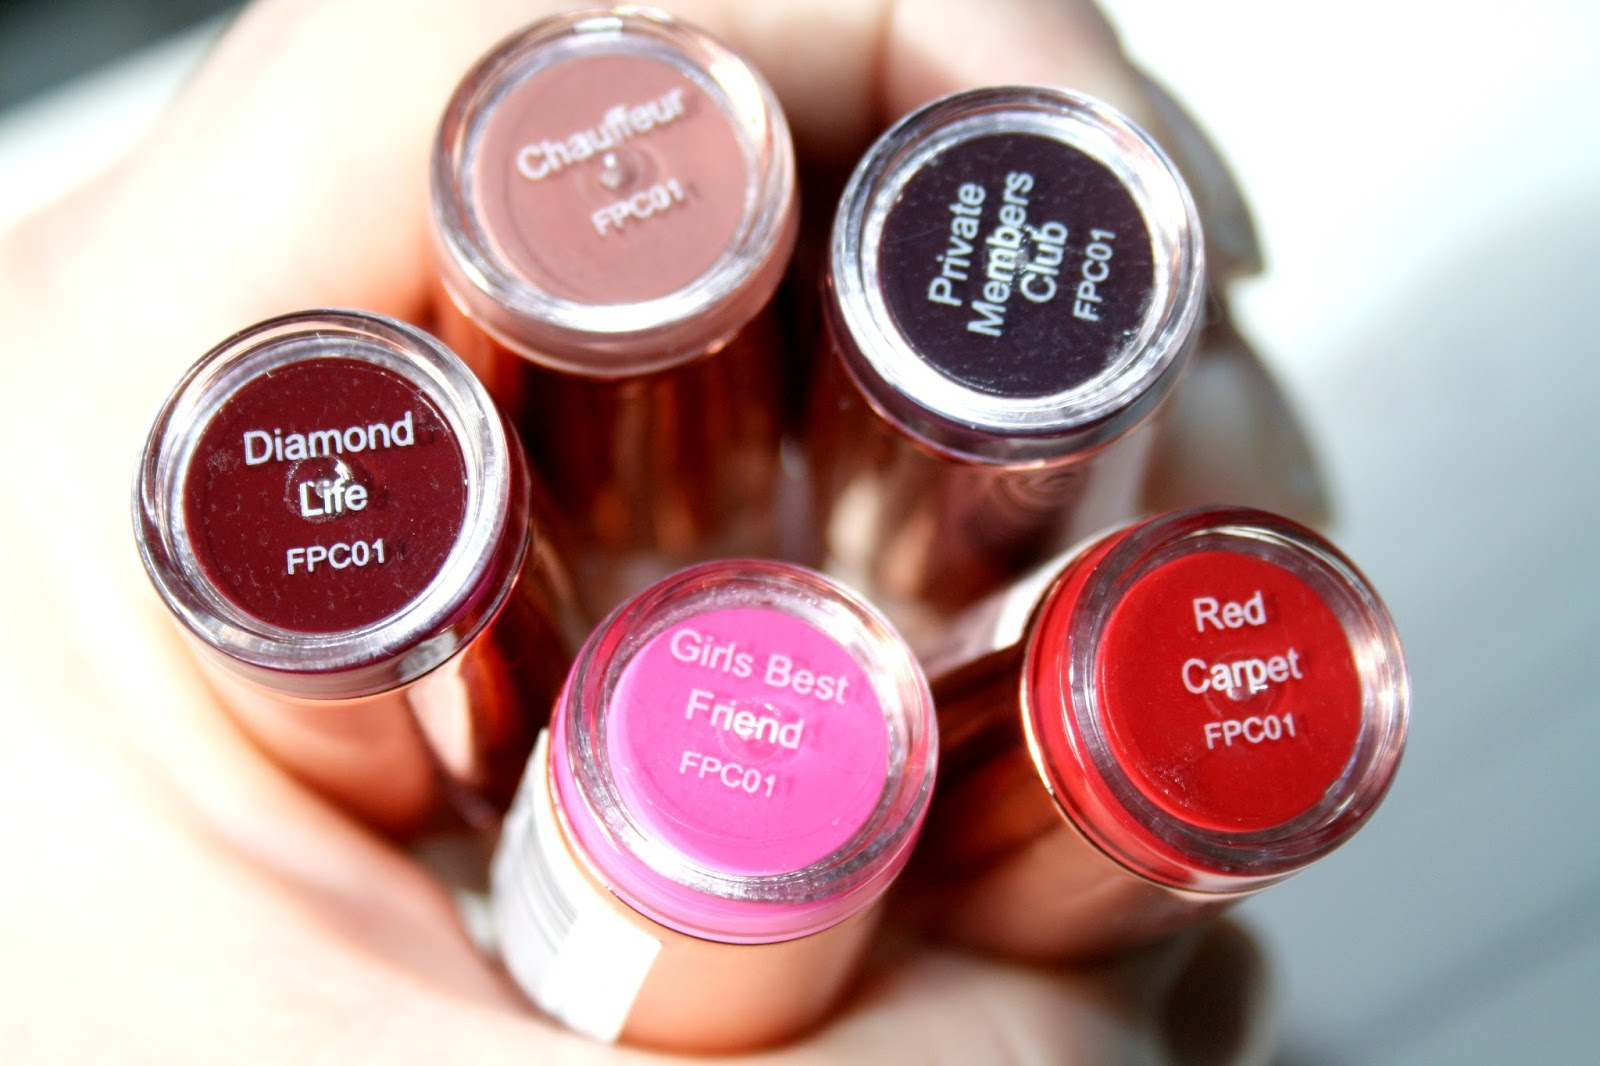 beautyqueenuk: Makeup Revolution Rose Gold Lipsticks